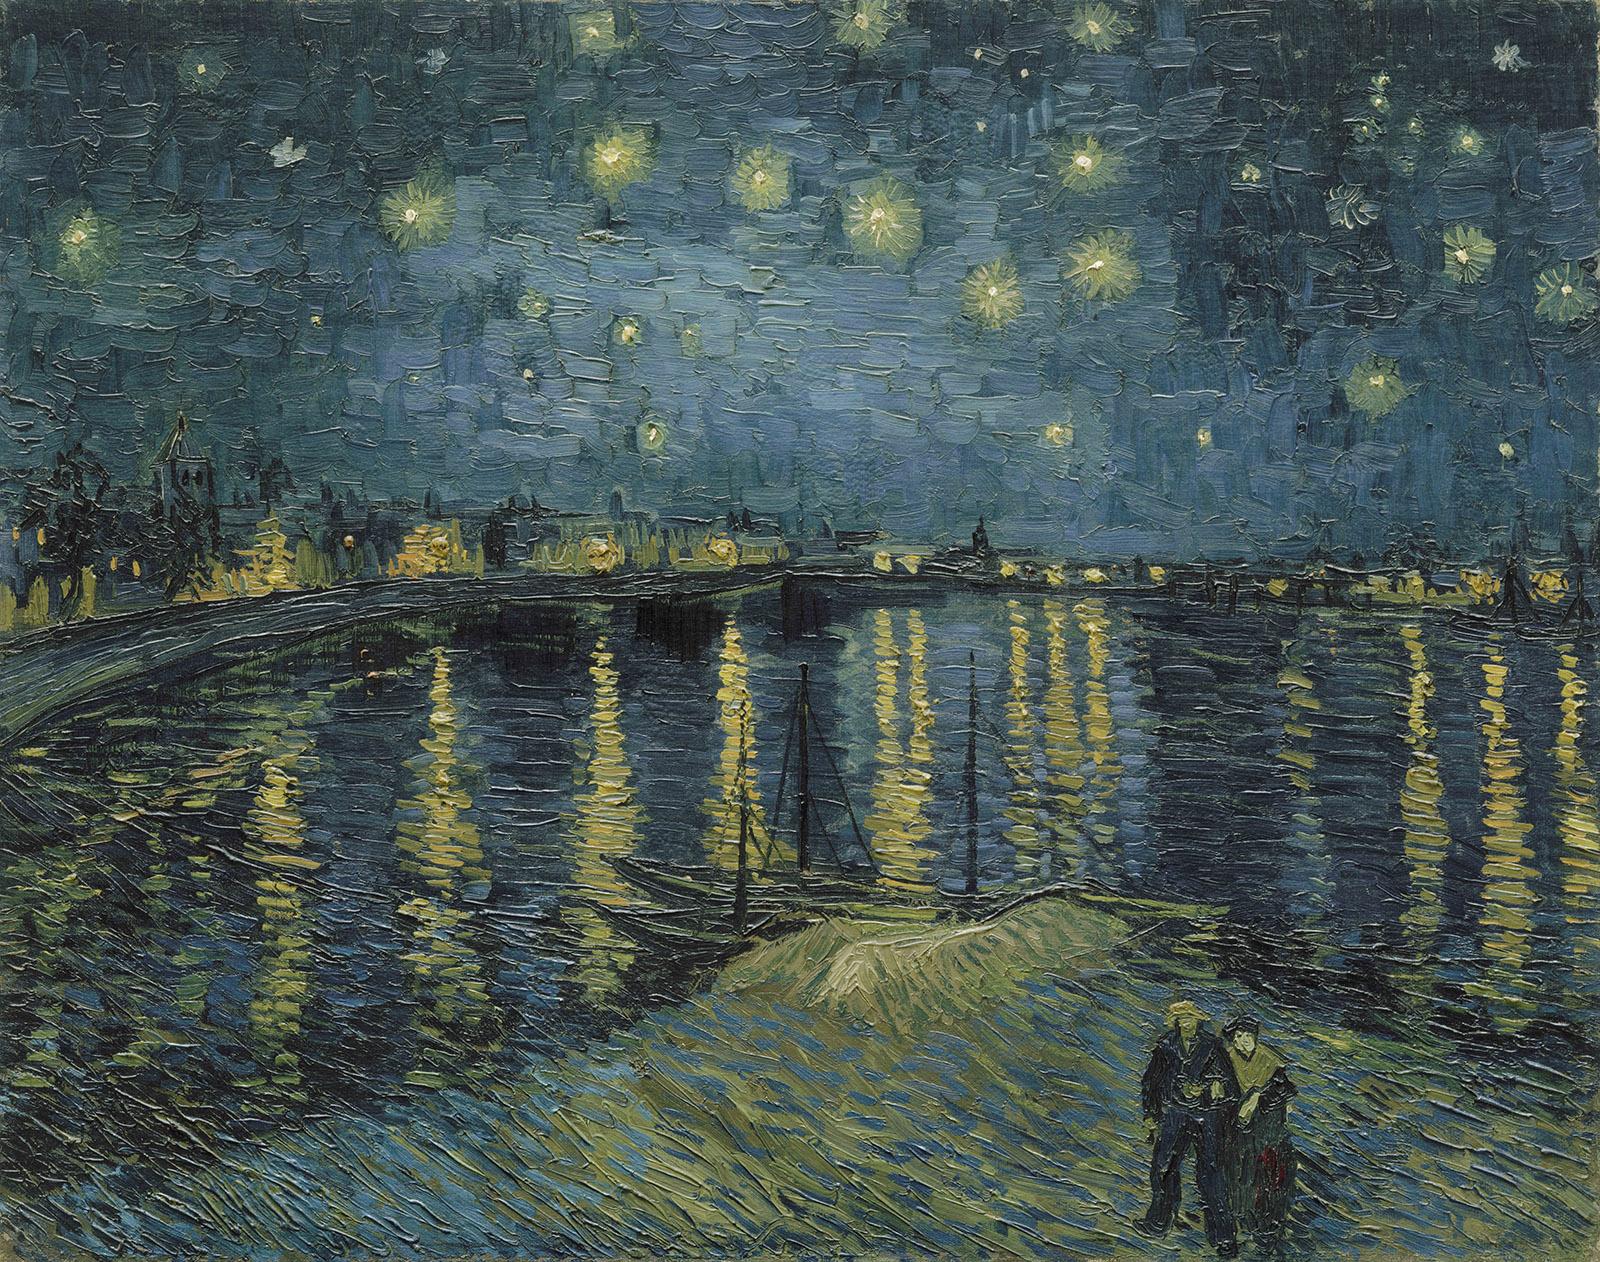 VanGogh   Starry Night, 1888   RMN Grand Palais Musee d'Orsay  Herve-Lewandowski